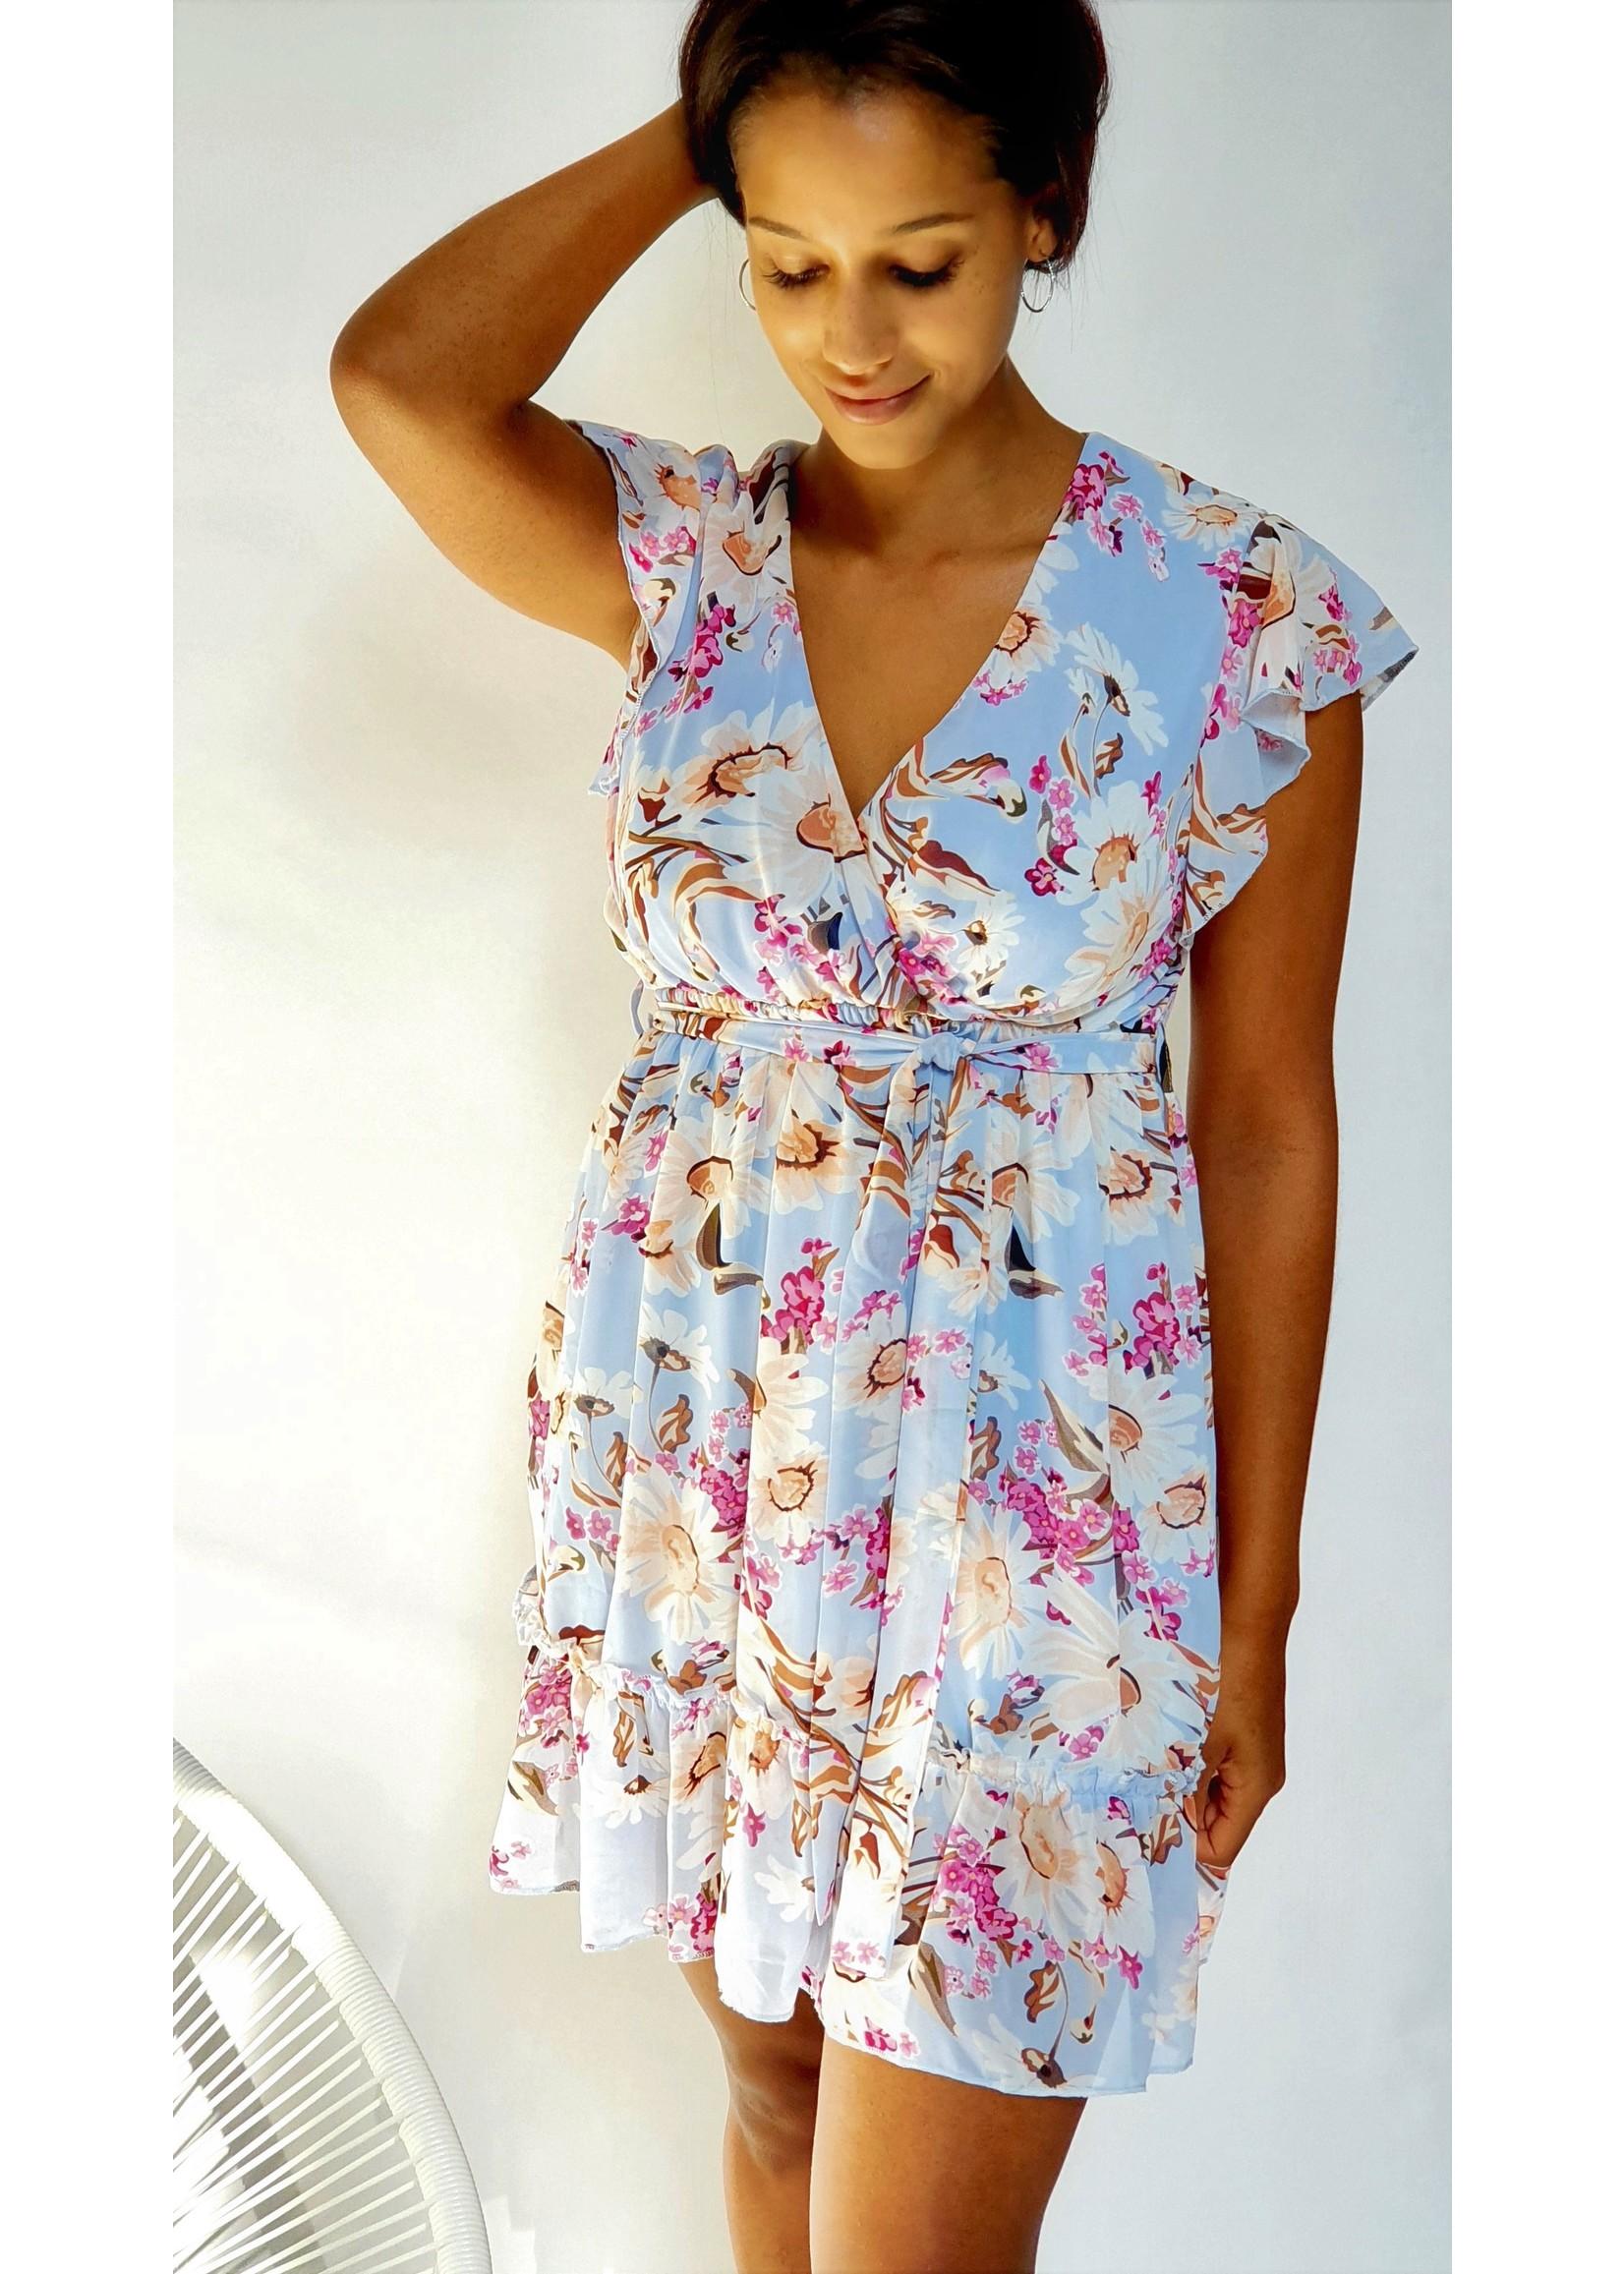 Thé shiny flower dress